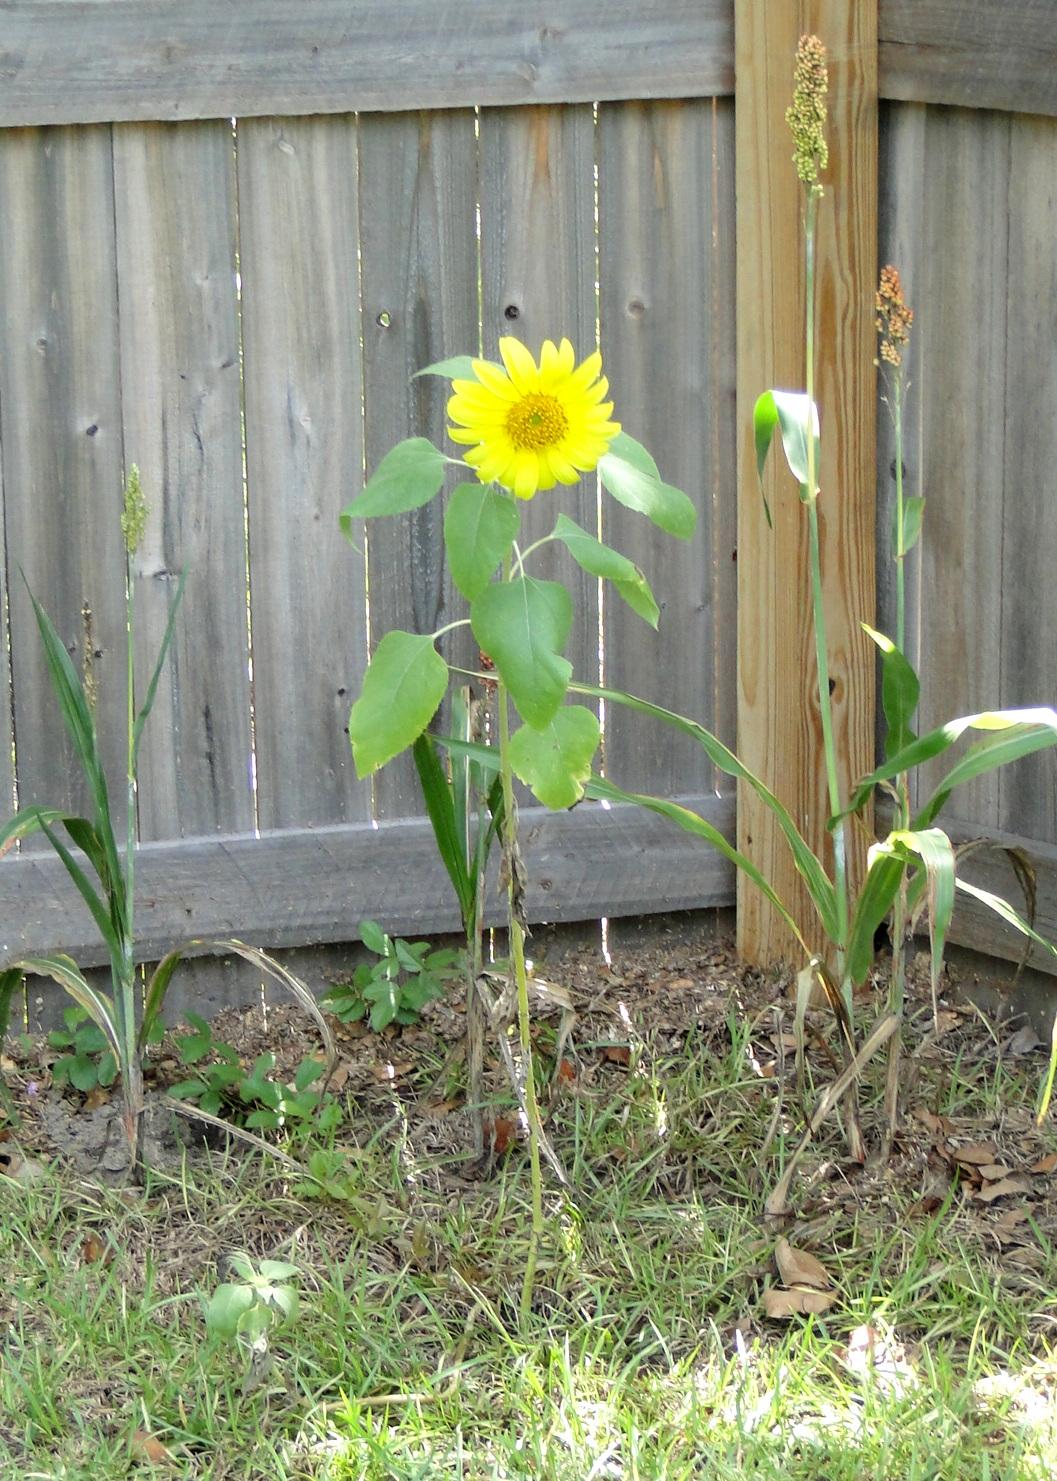 Sunflower The Journey Of Parenthood